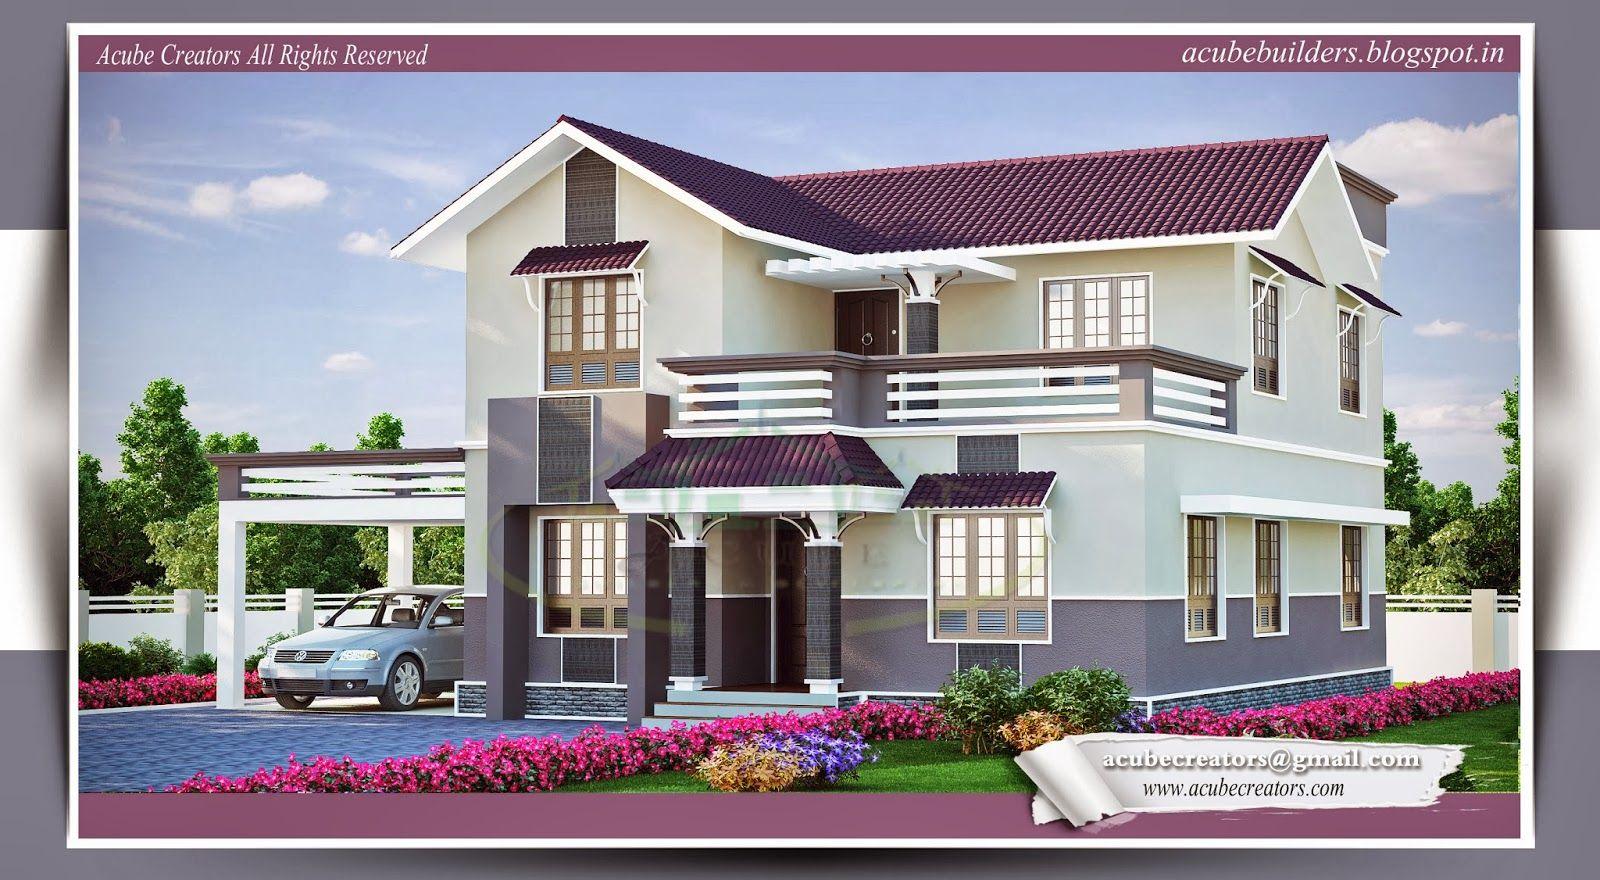 Admirable Kerala Beautiful House Plans Photos Home Decoration Pinterest Largest Home Design Picture Inspirations Pitcheantrous